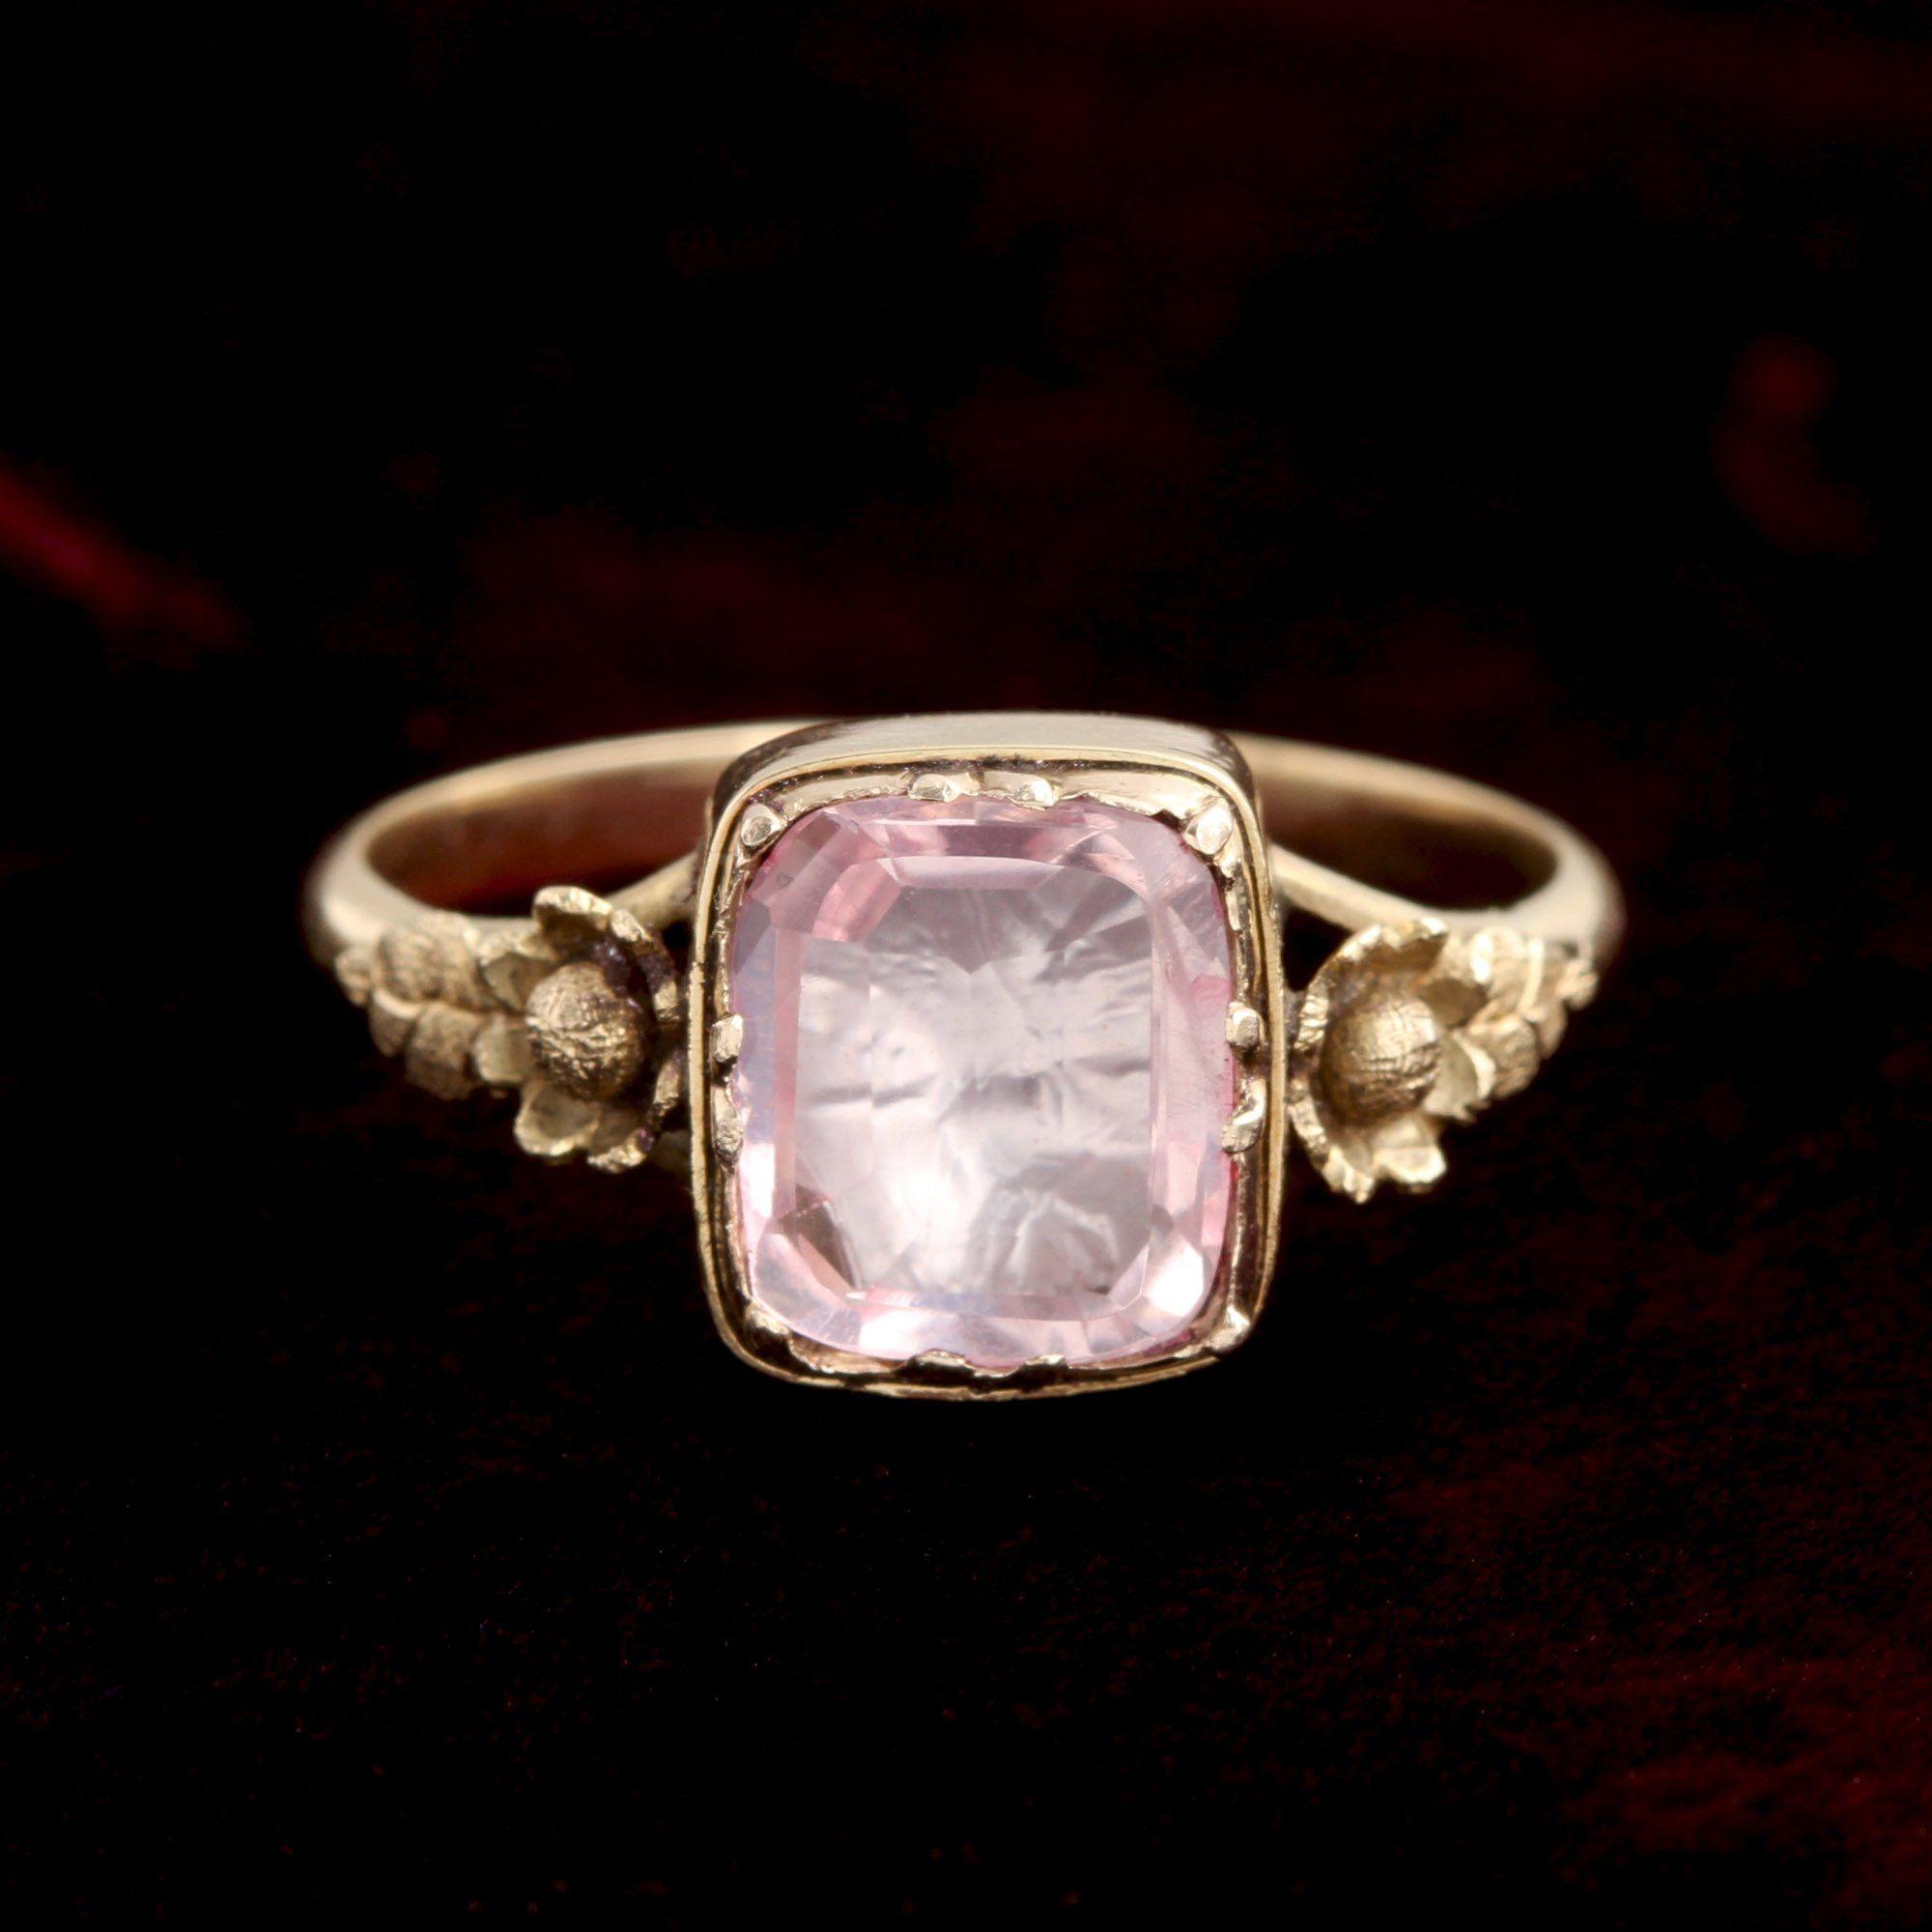 Georgian Pink-Foiled Rock Crystal Ring